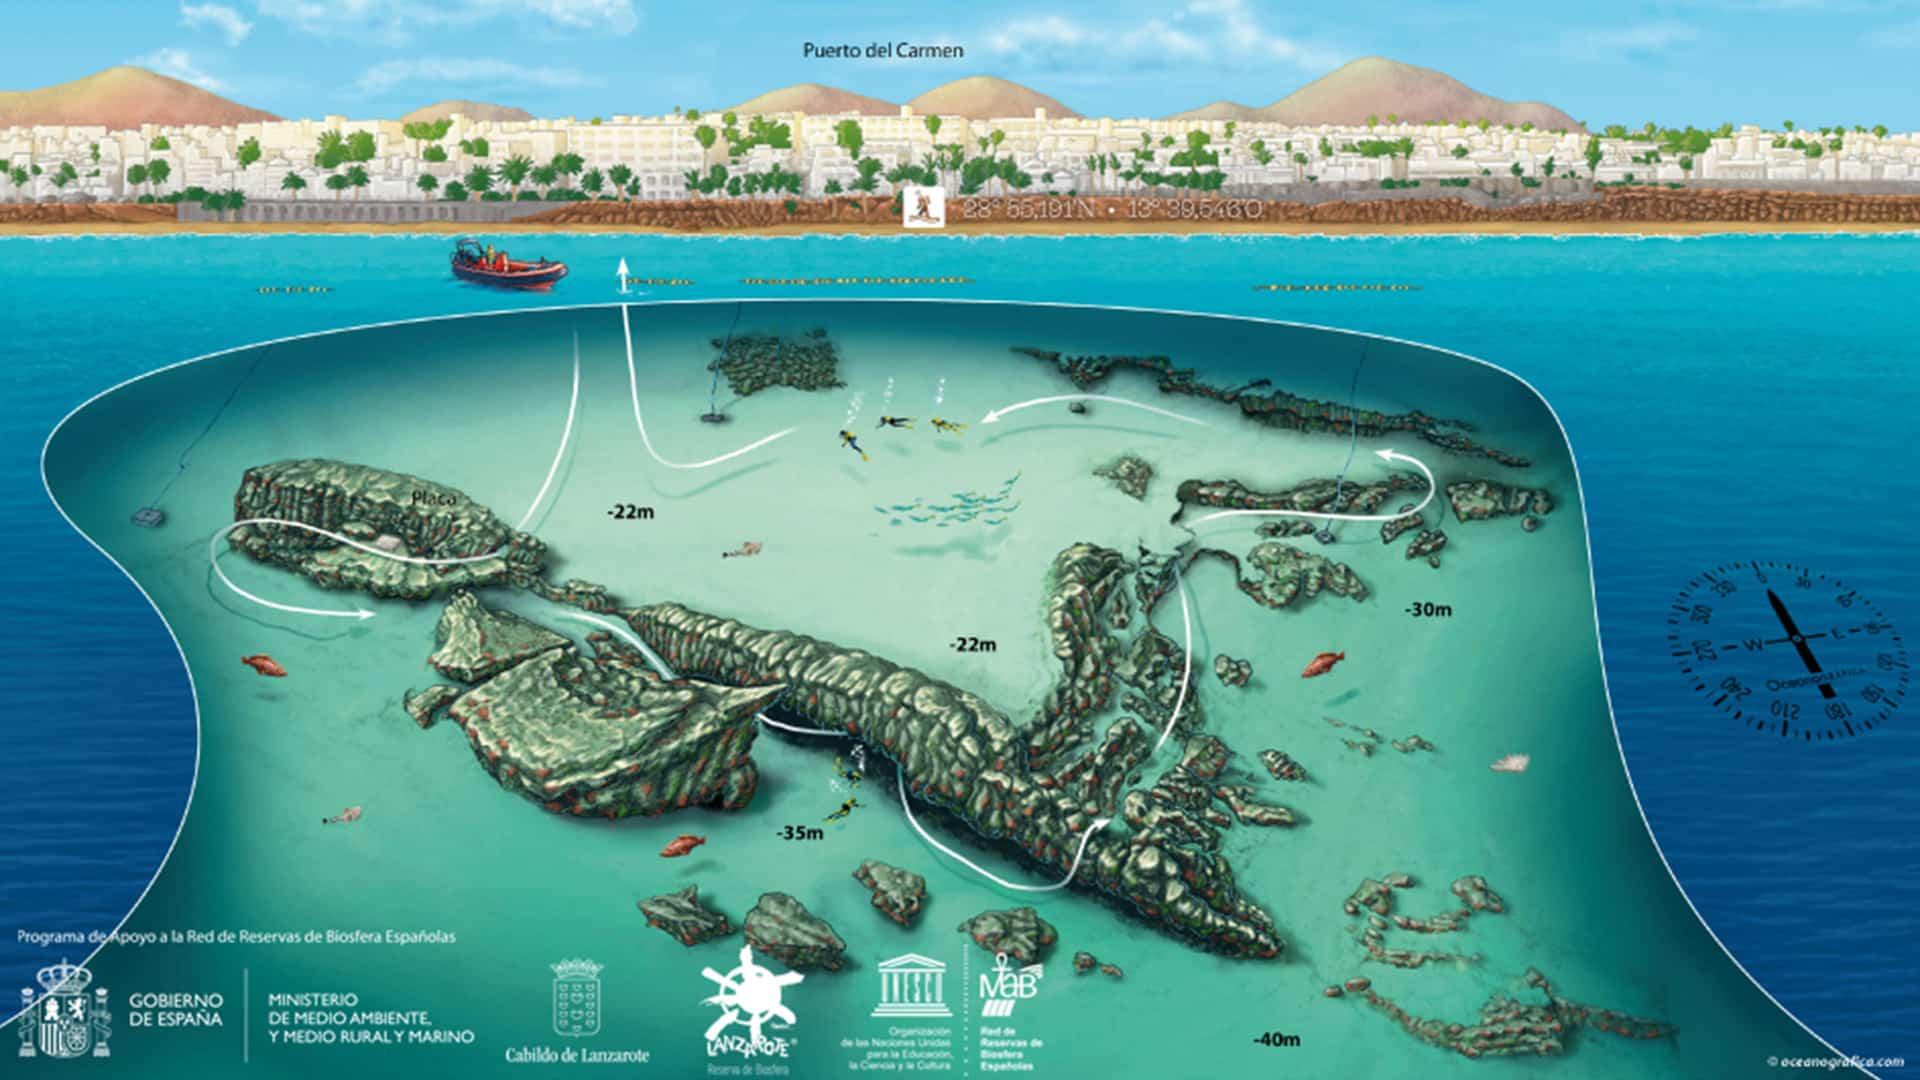 mojo dive ocean divers richies place mapa lanzarote